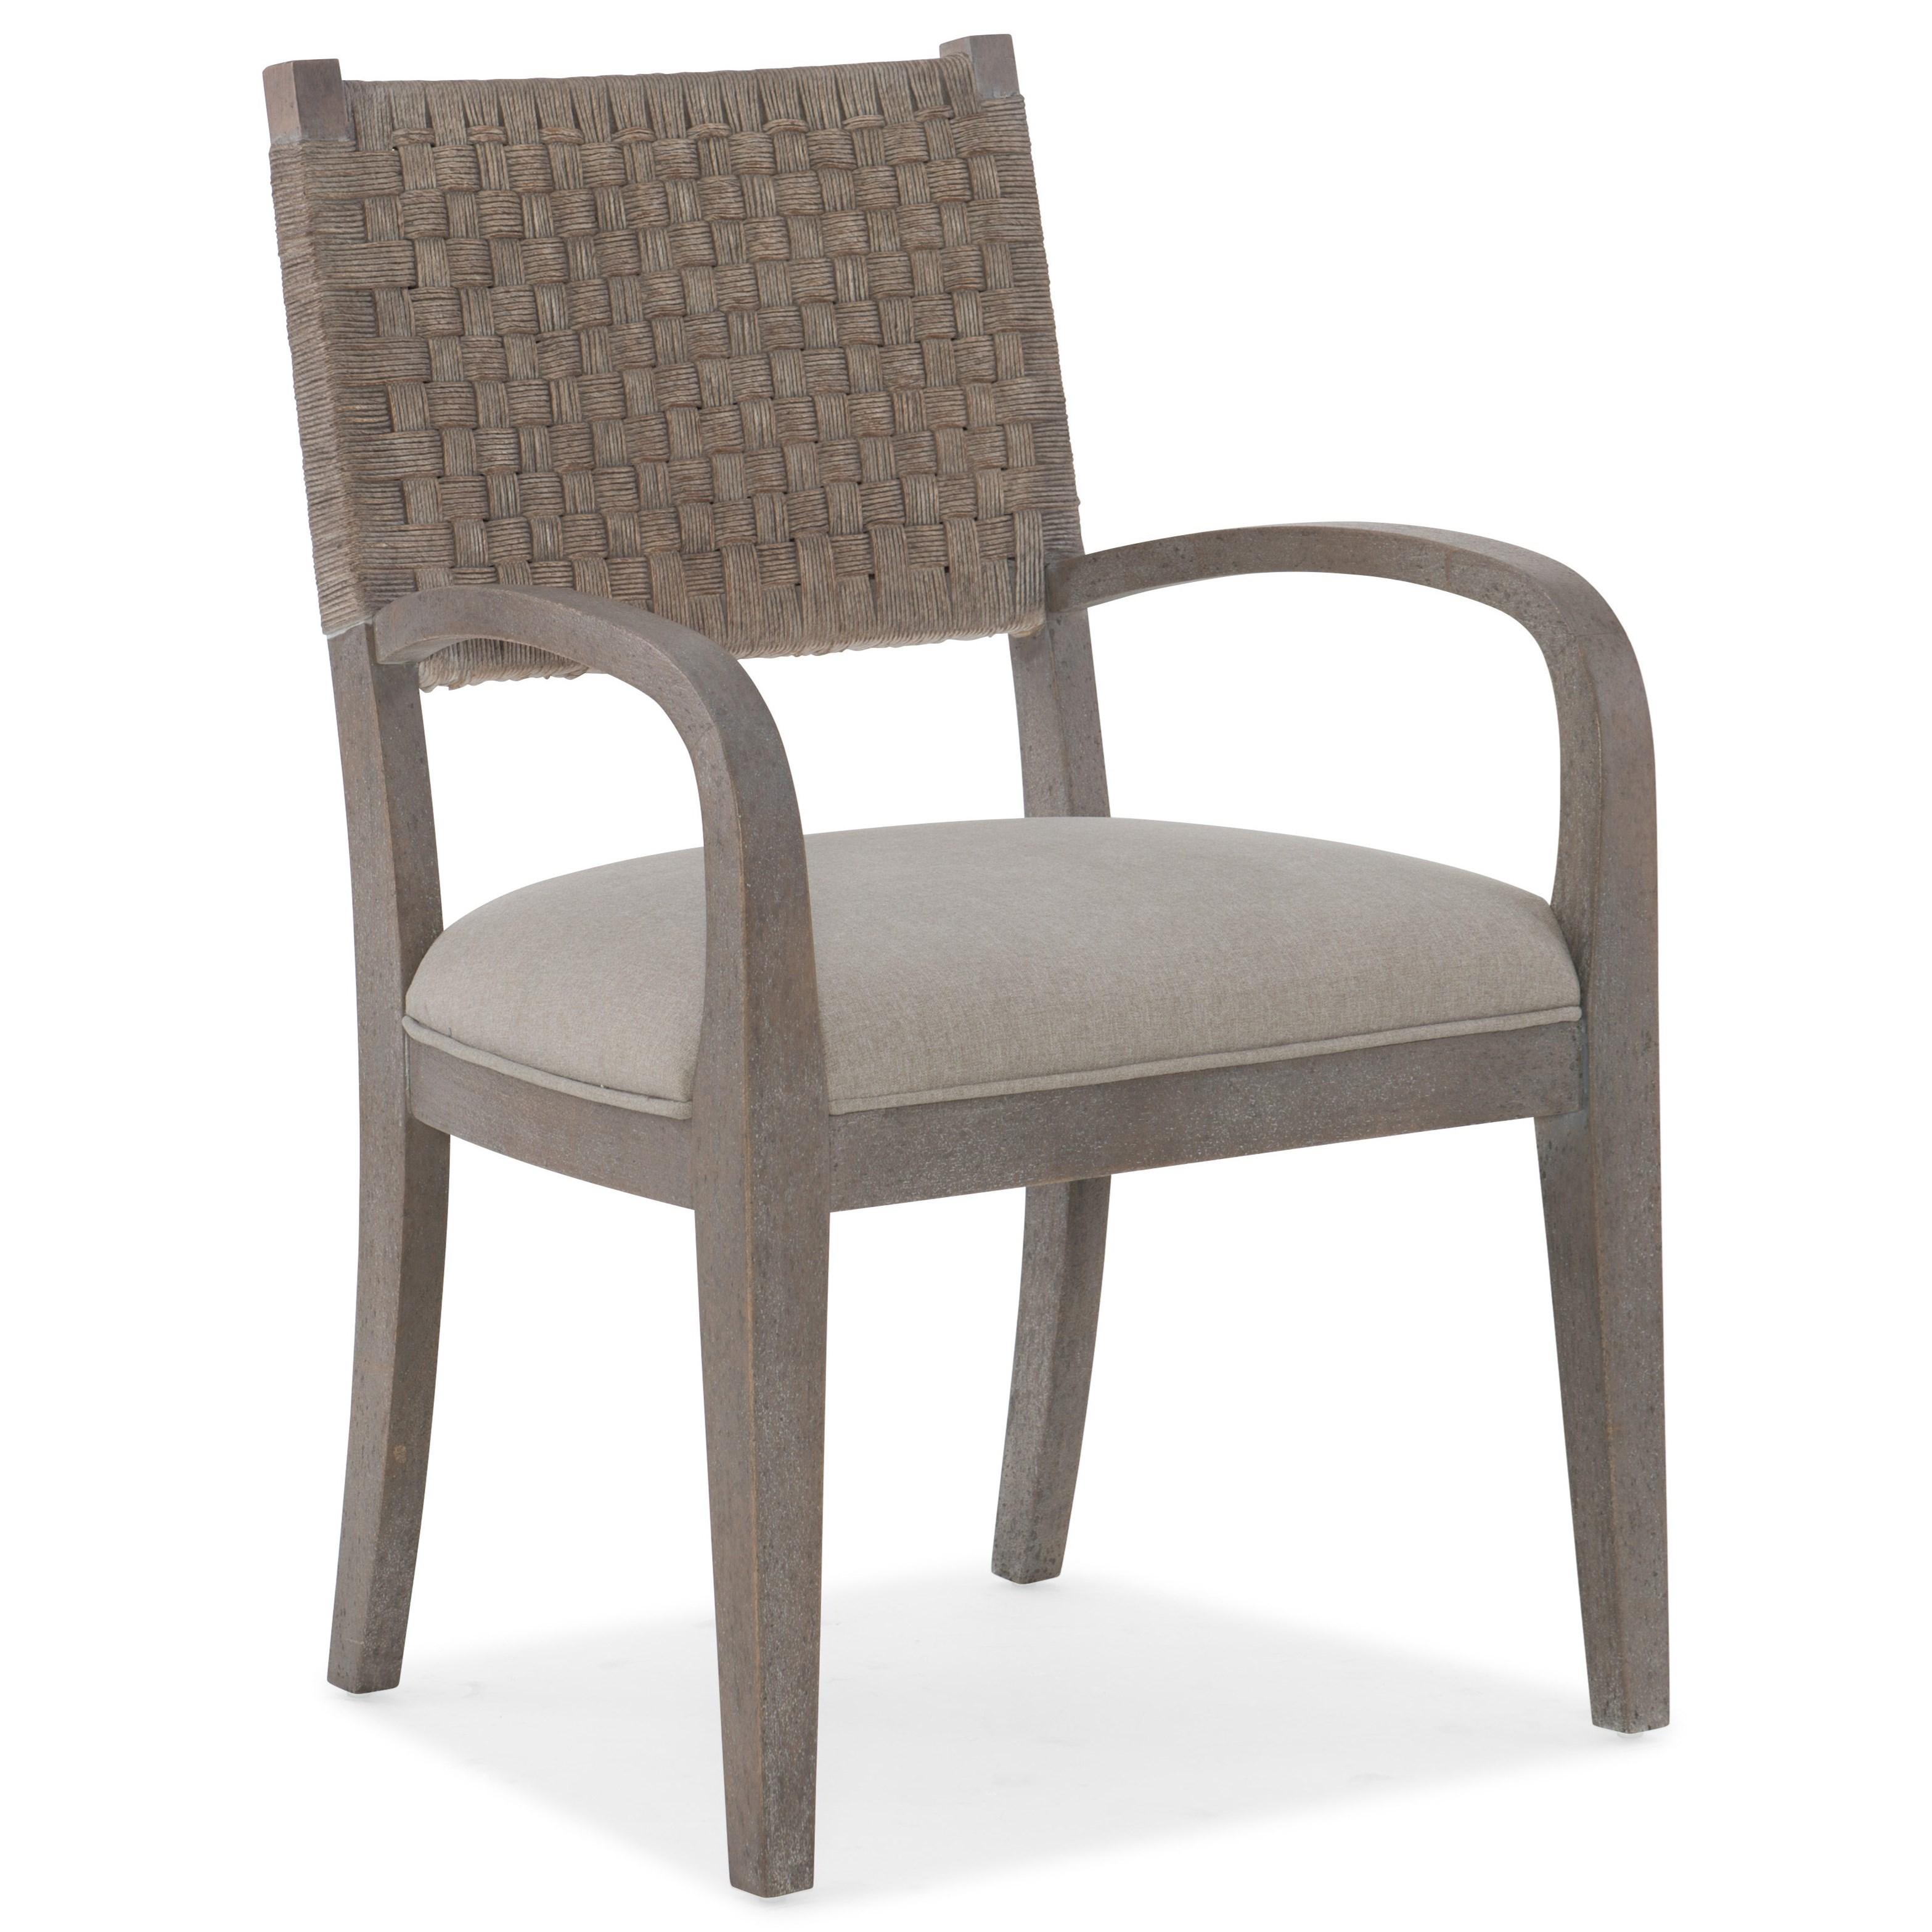 Artemis Woven Arm Chair